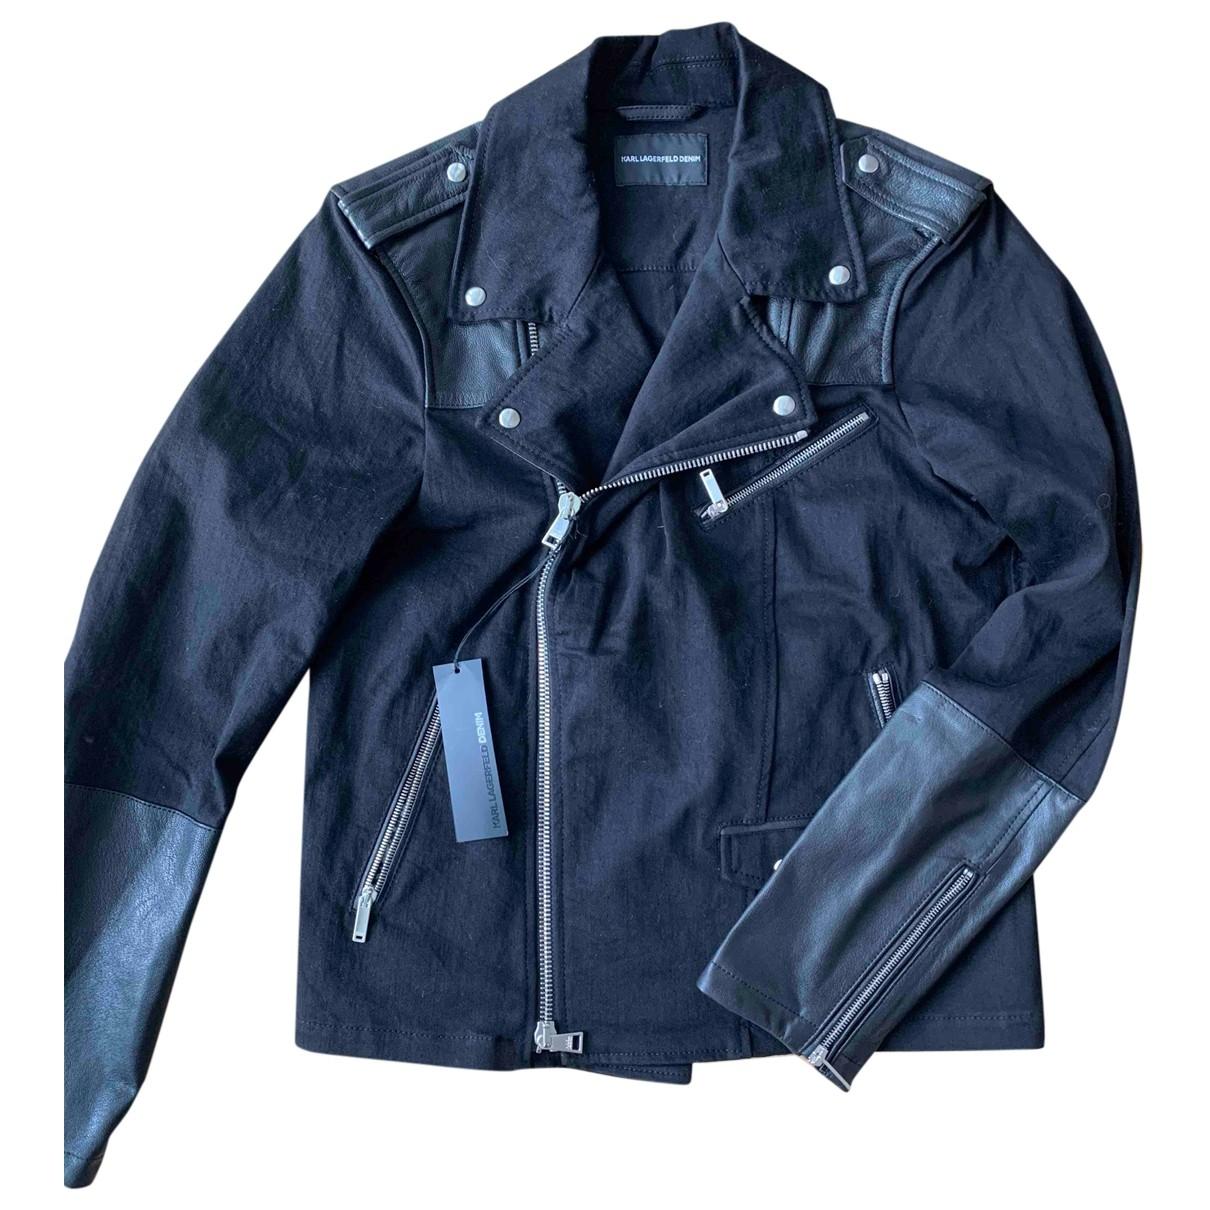 Karl Lagerfeld \N Black Leather jacket  for Men L International